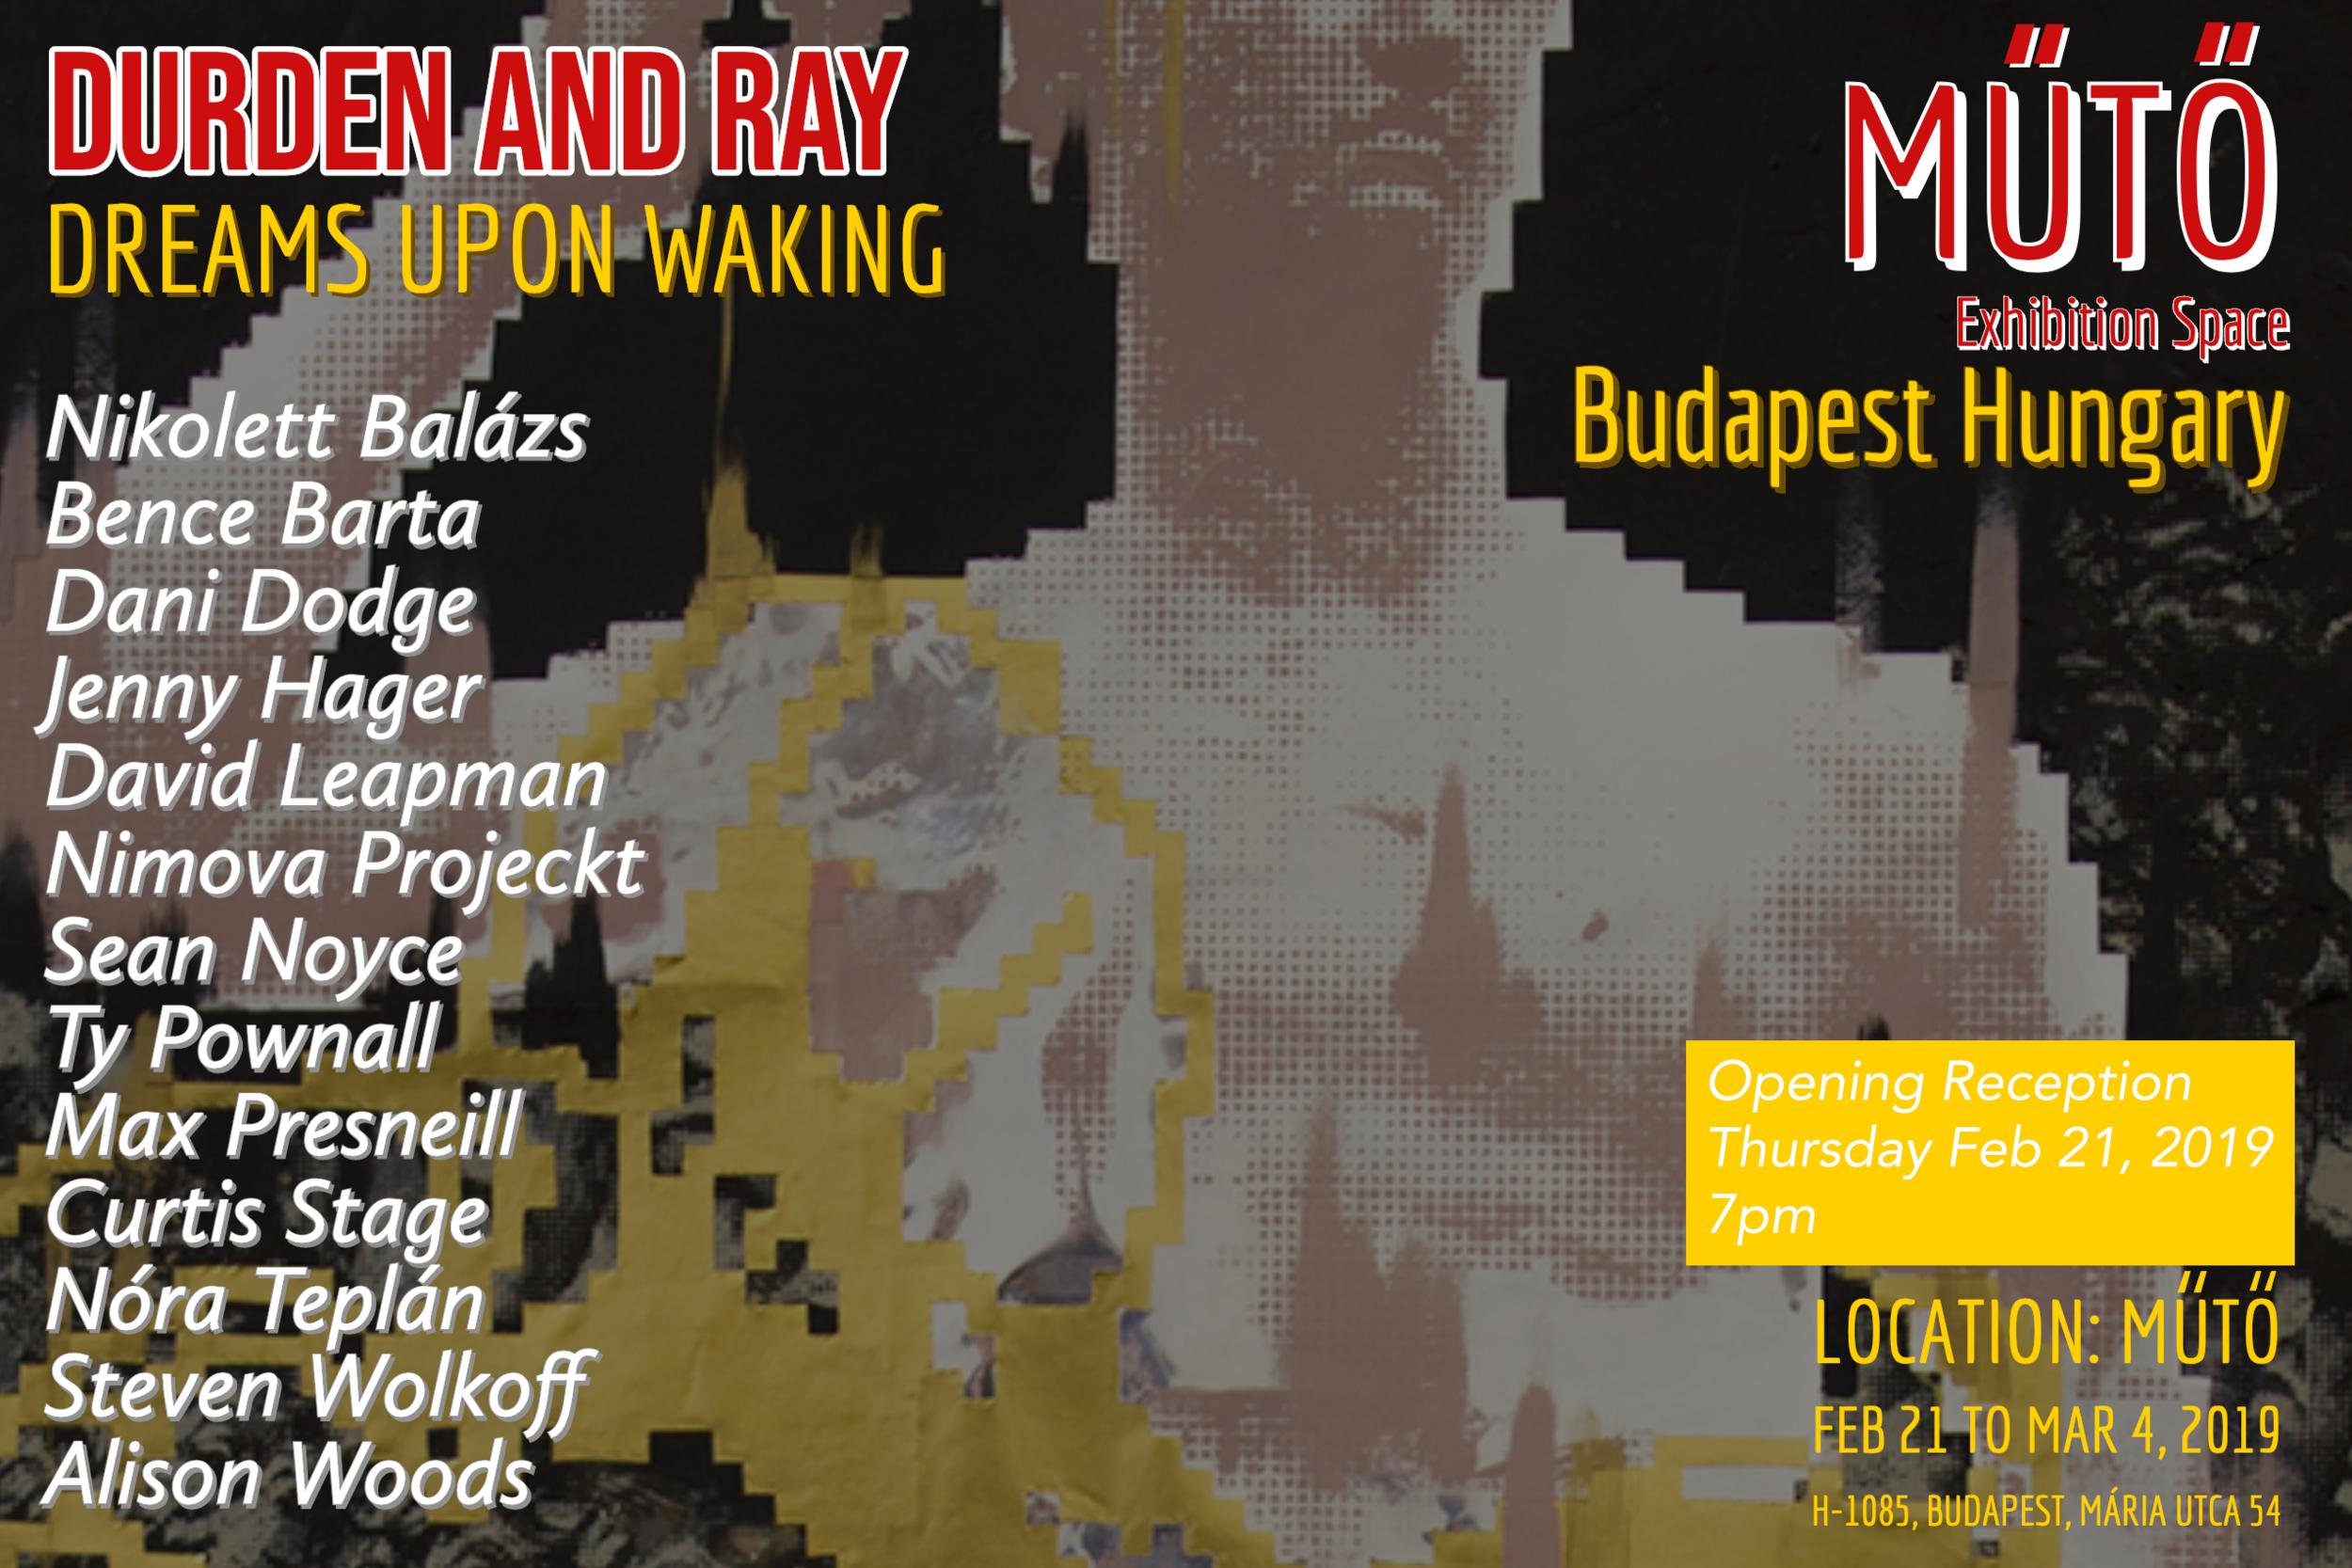 Dreams Upon WakingMUTO - Budapest Hungary - Curator: Steven WOLKOFFExhibiting artists: BARTA Bence, BALÁZS Nikolett, Dani DODGE, Jenny HAGER, David LEAPMAN, NIMOVA Projeckt, Sean NOYCE, Ty POWNALL, Max PRESNEILL, Curtis STAGE, TEPLÁN Nóra, Steven WOLKOFF, Alison WOODSFeb 21 to March 4, 2019